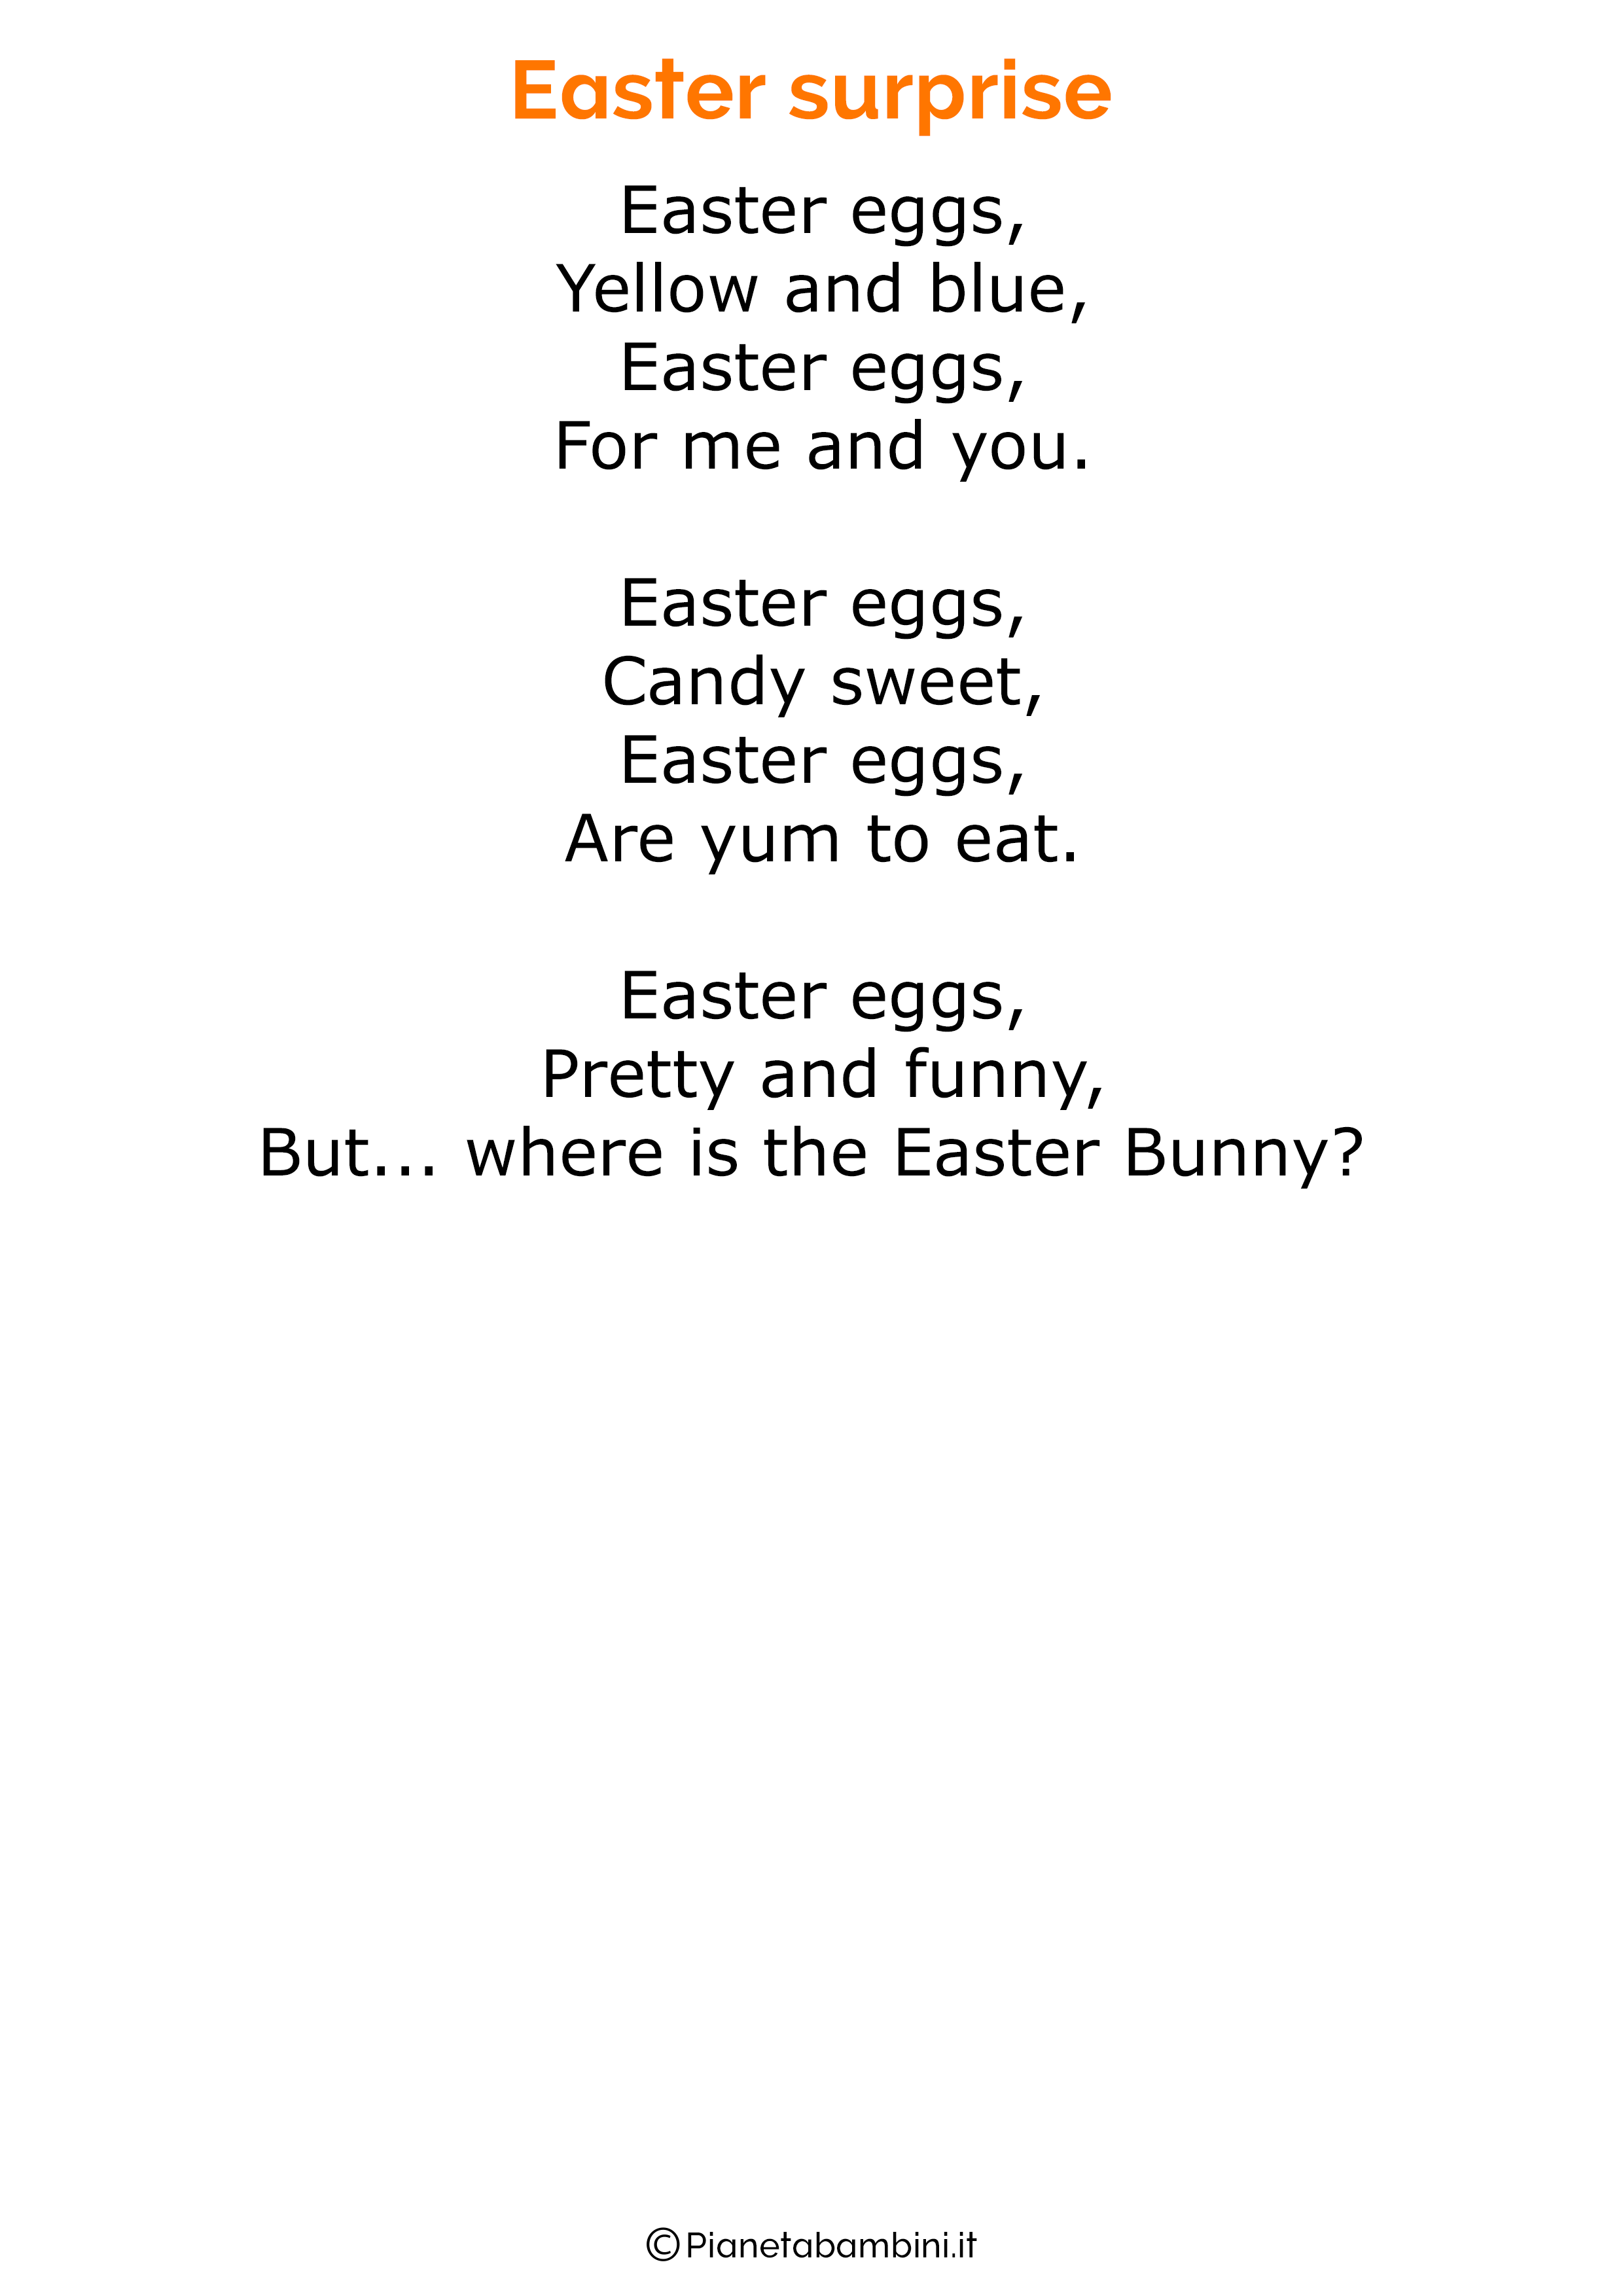 Poesie di Pasqua in inglese per bambini 10